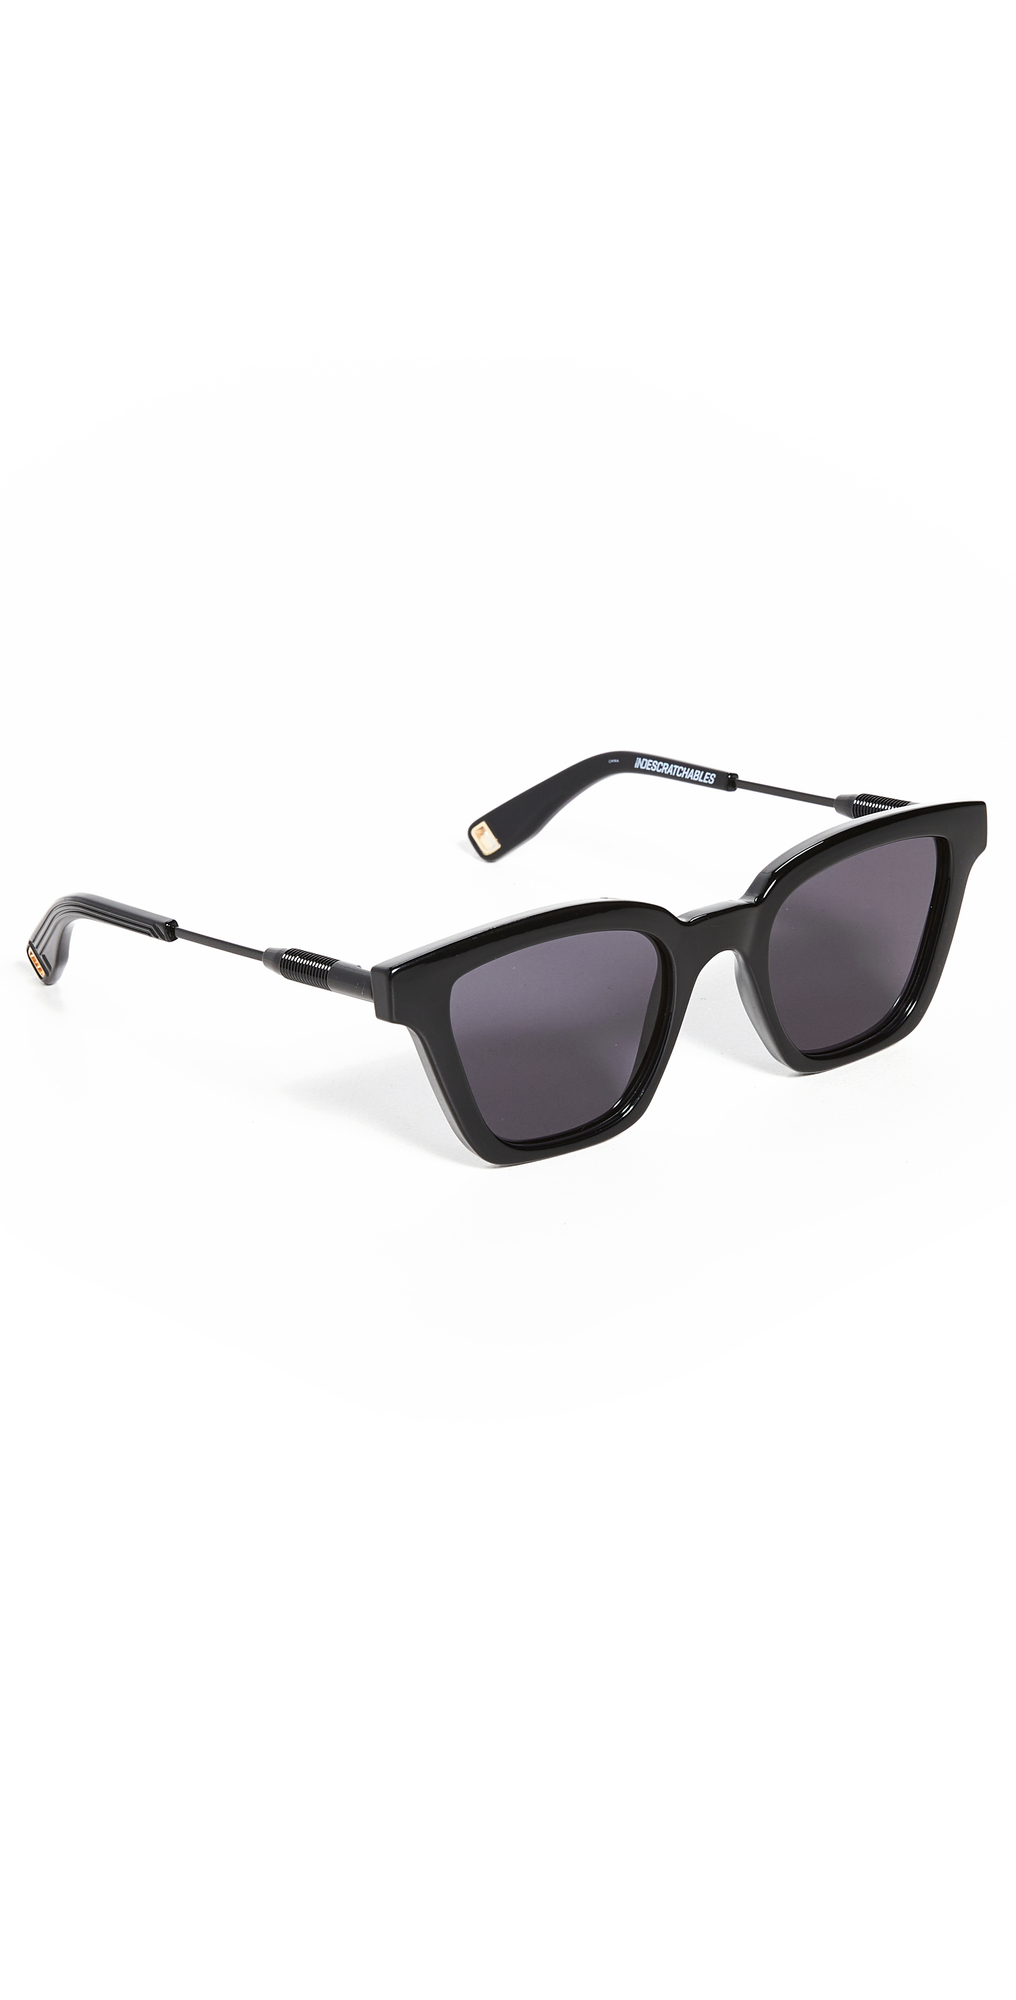 Flex 02 Sunglasses